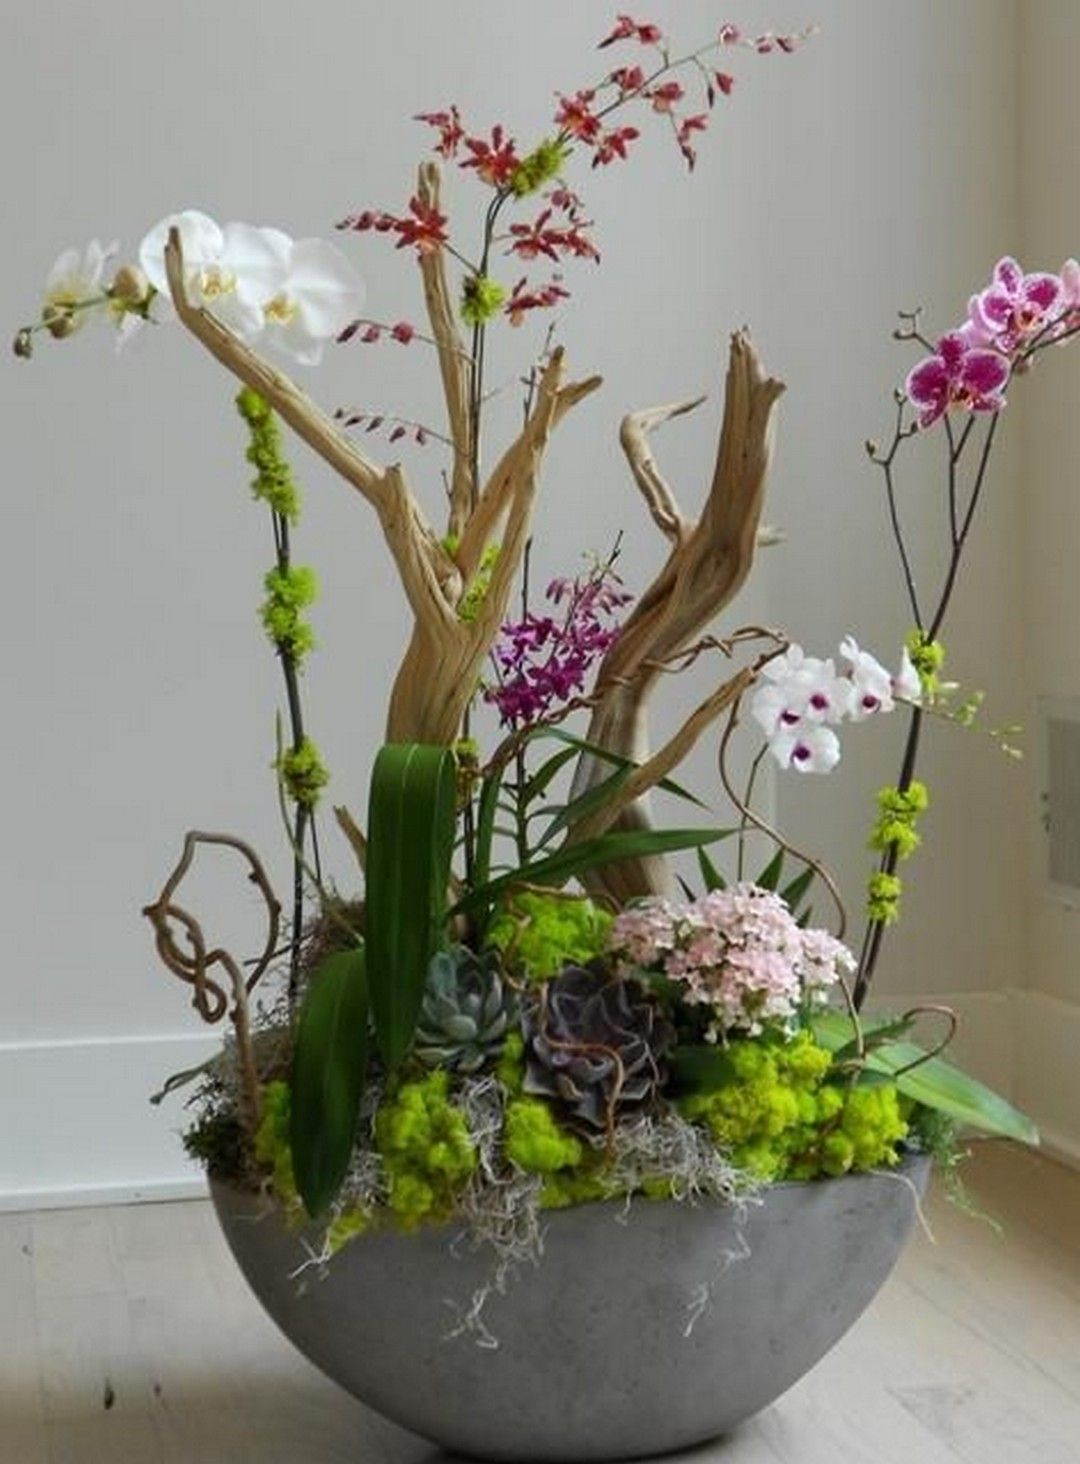 Best Orchid Arrangements With Succulents And Driftwood (50 #orchideenpflege